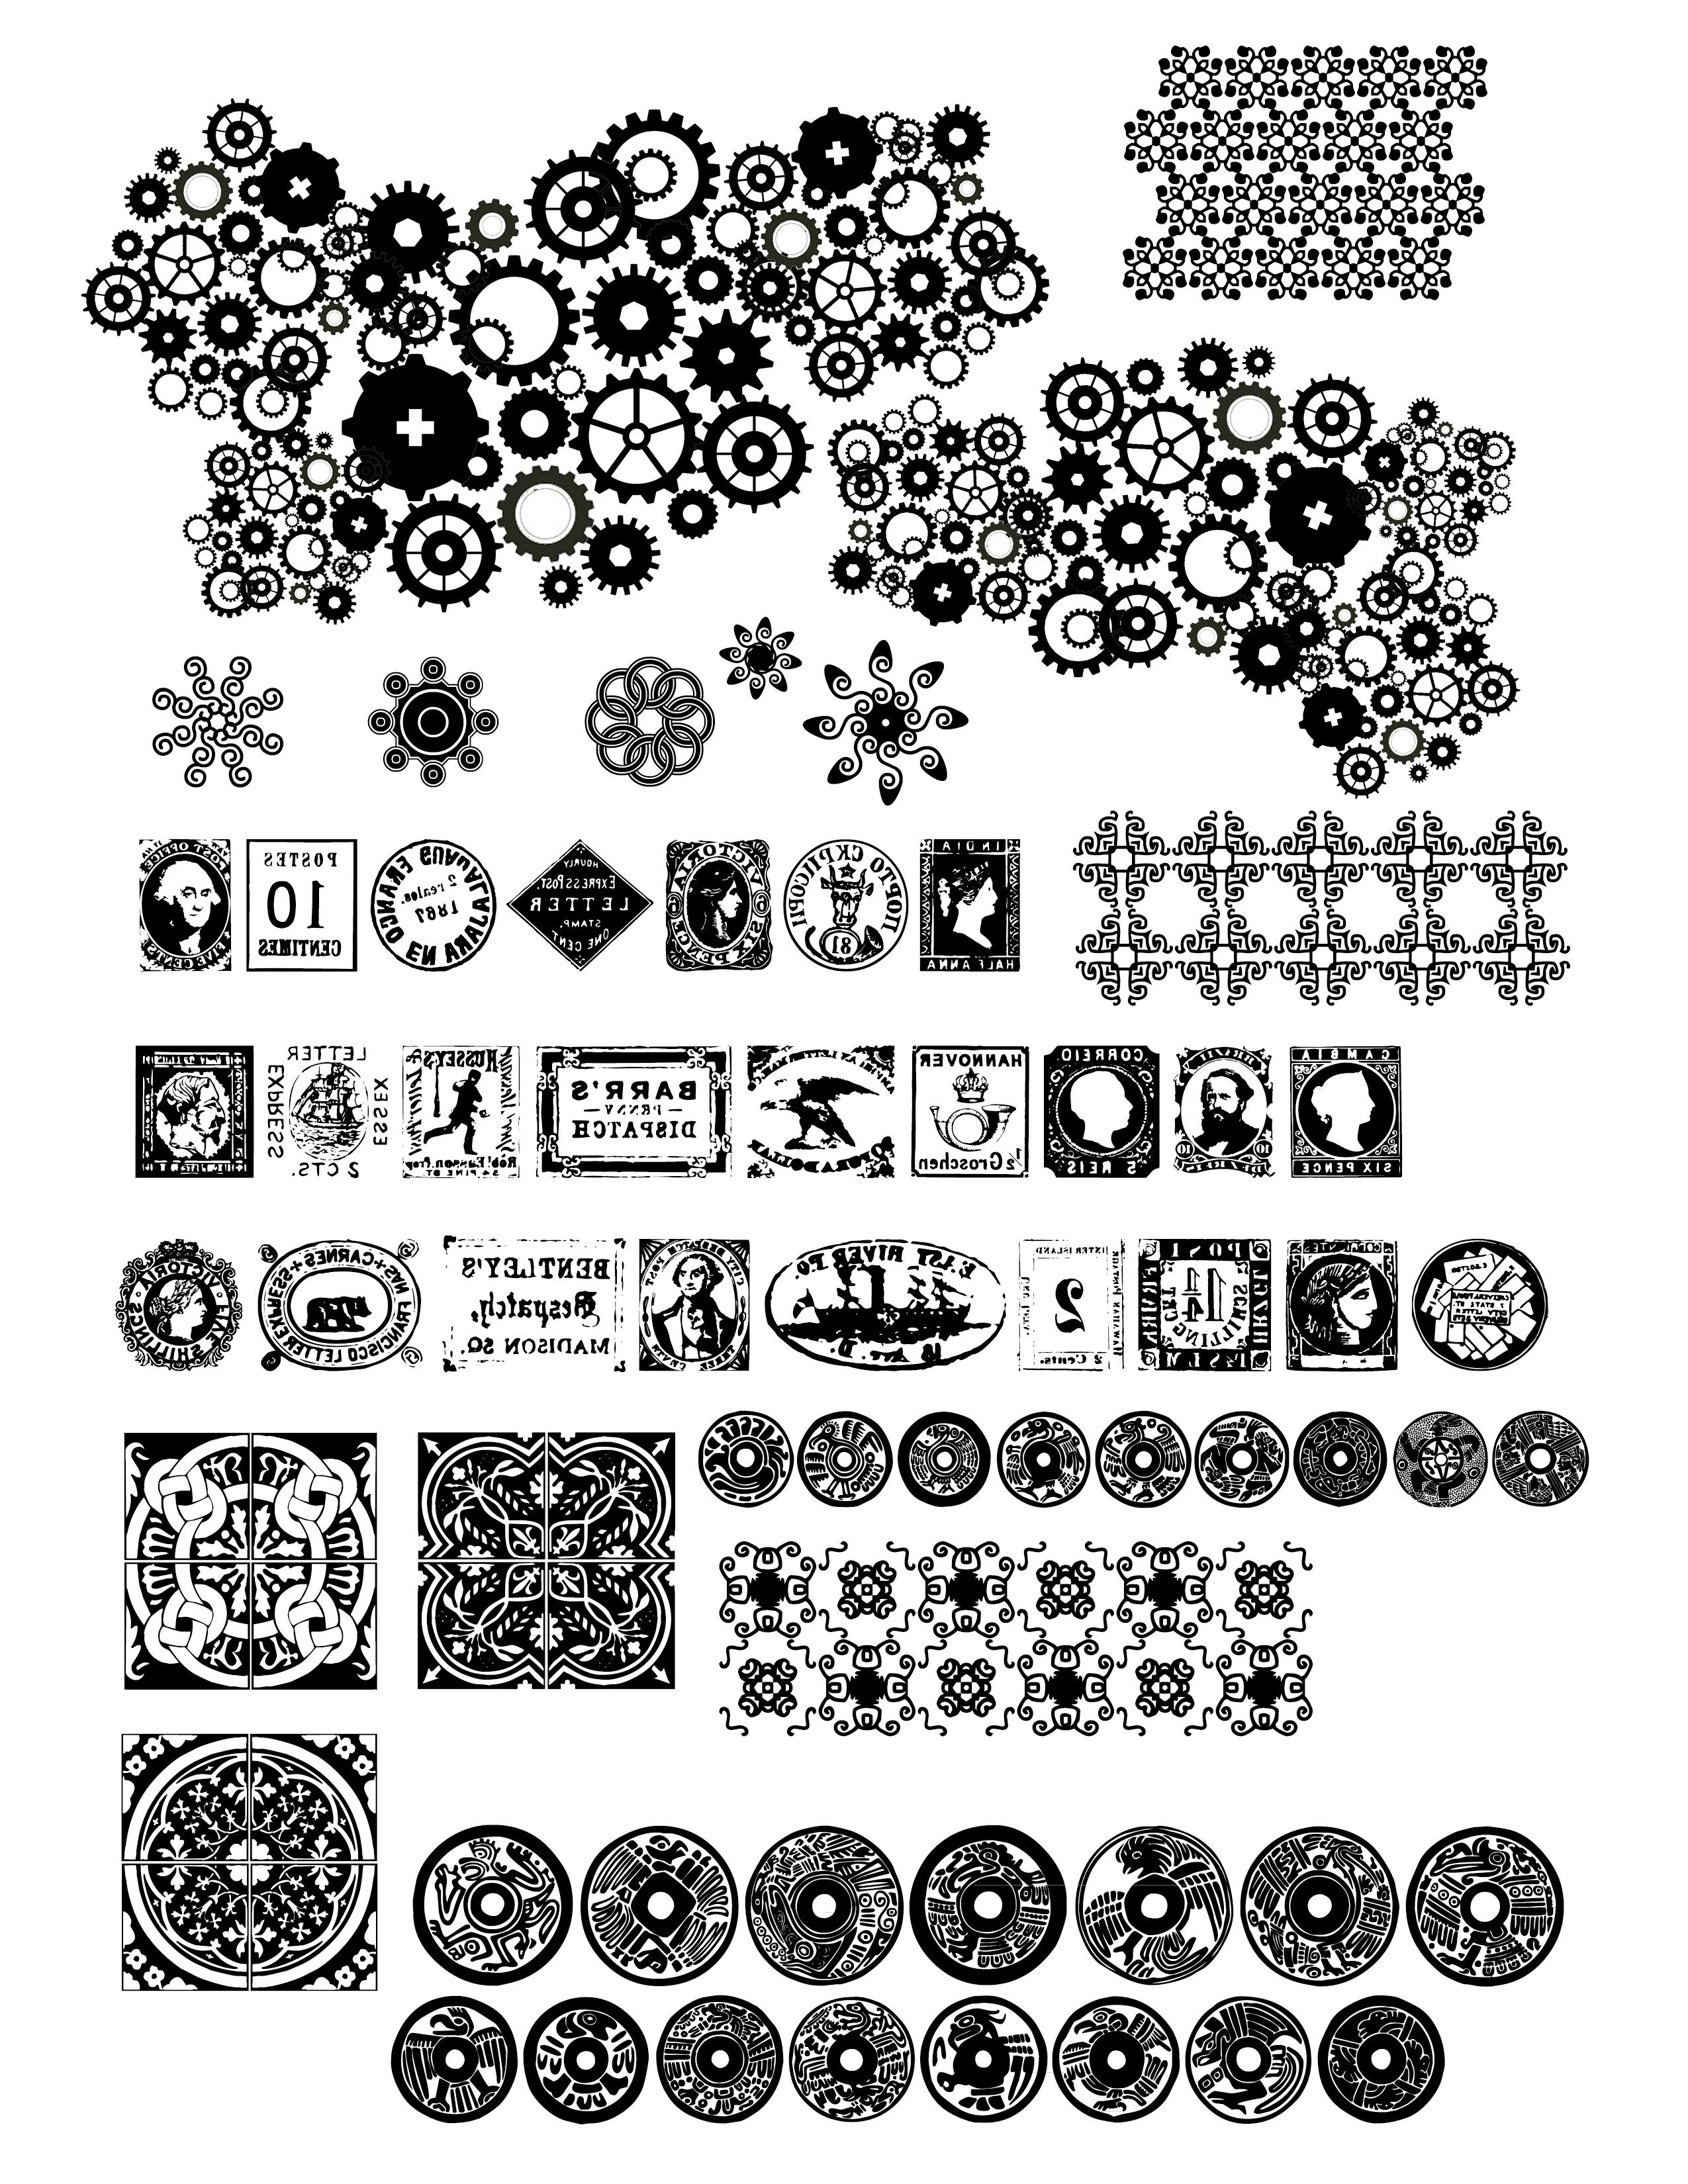 Dingbat Fonts | Sarajane's Polyclay Gallery